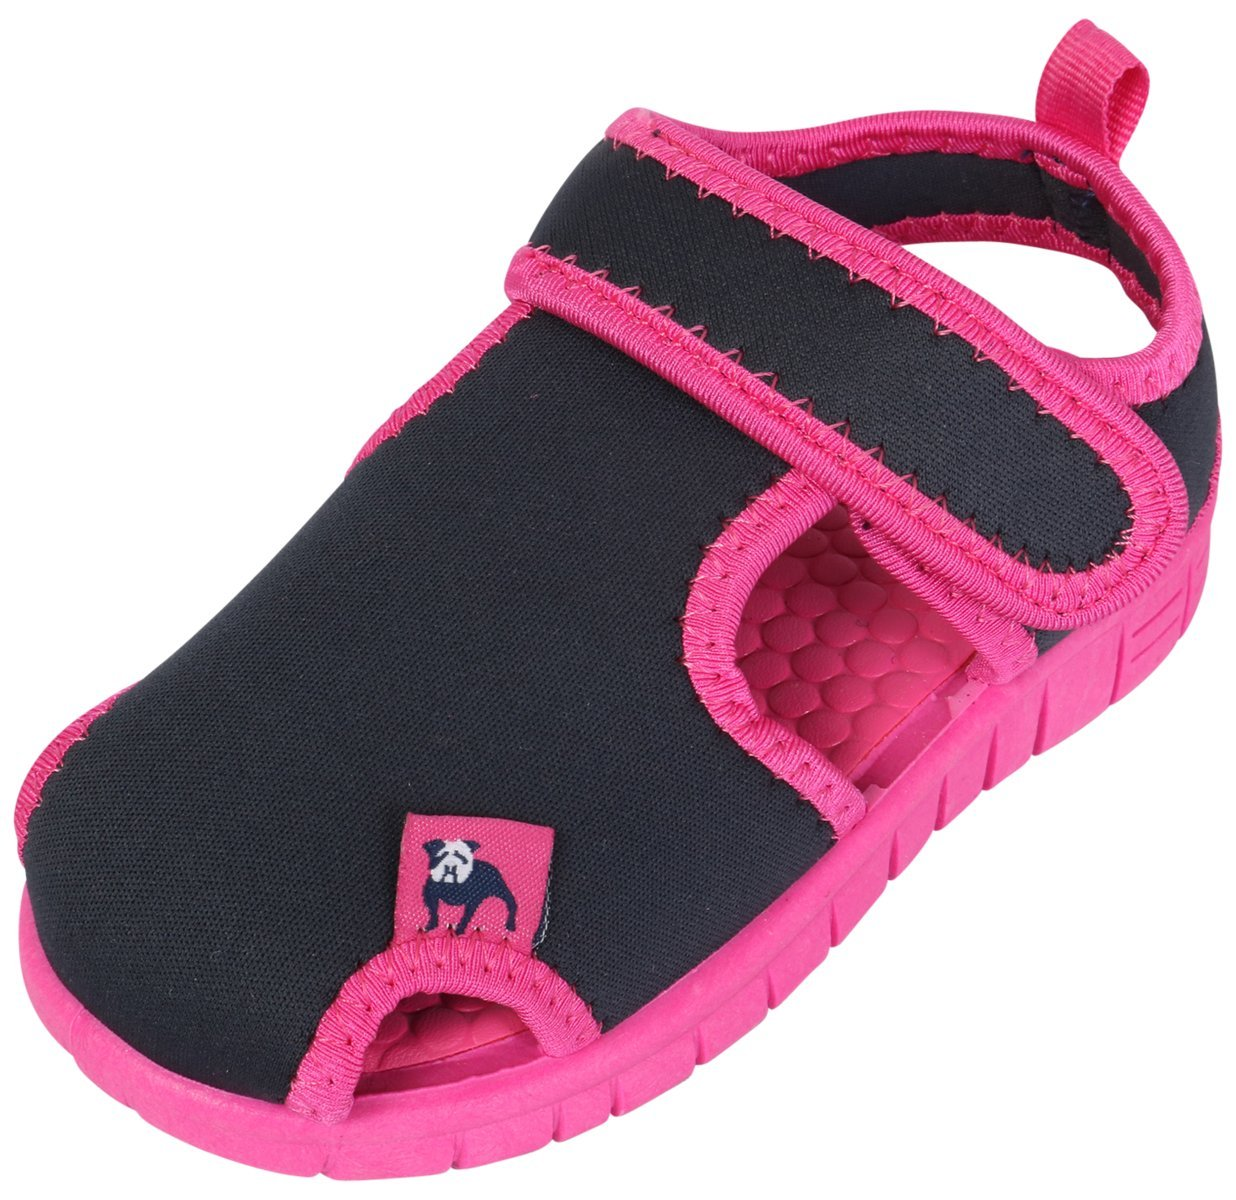 BUM Equipment Boys Water Shoes